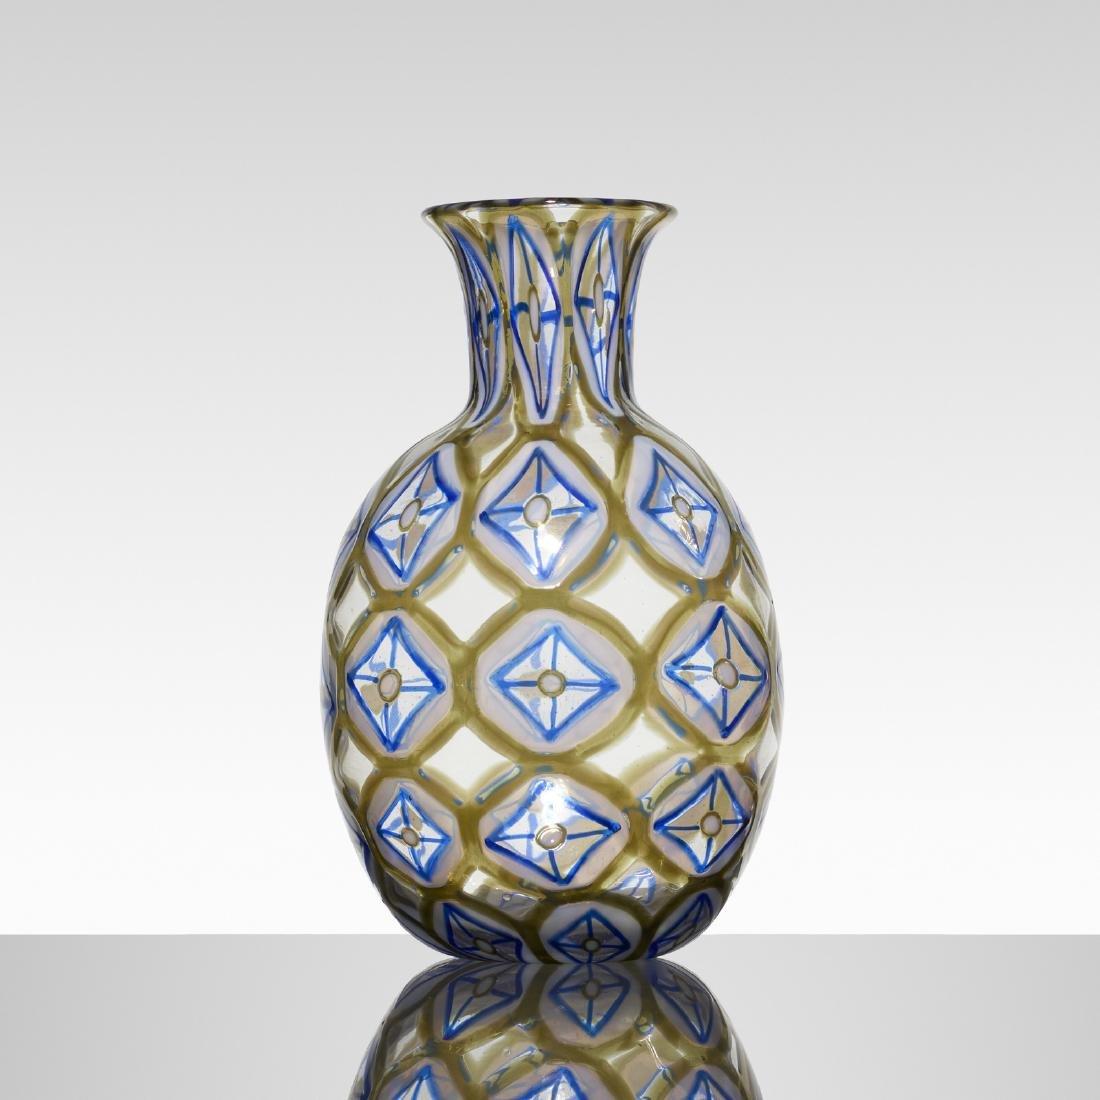 Ercole Barovier, Athena Cattedrale vase